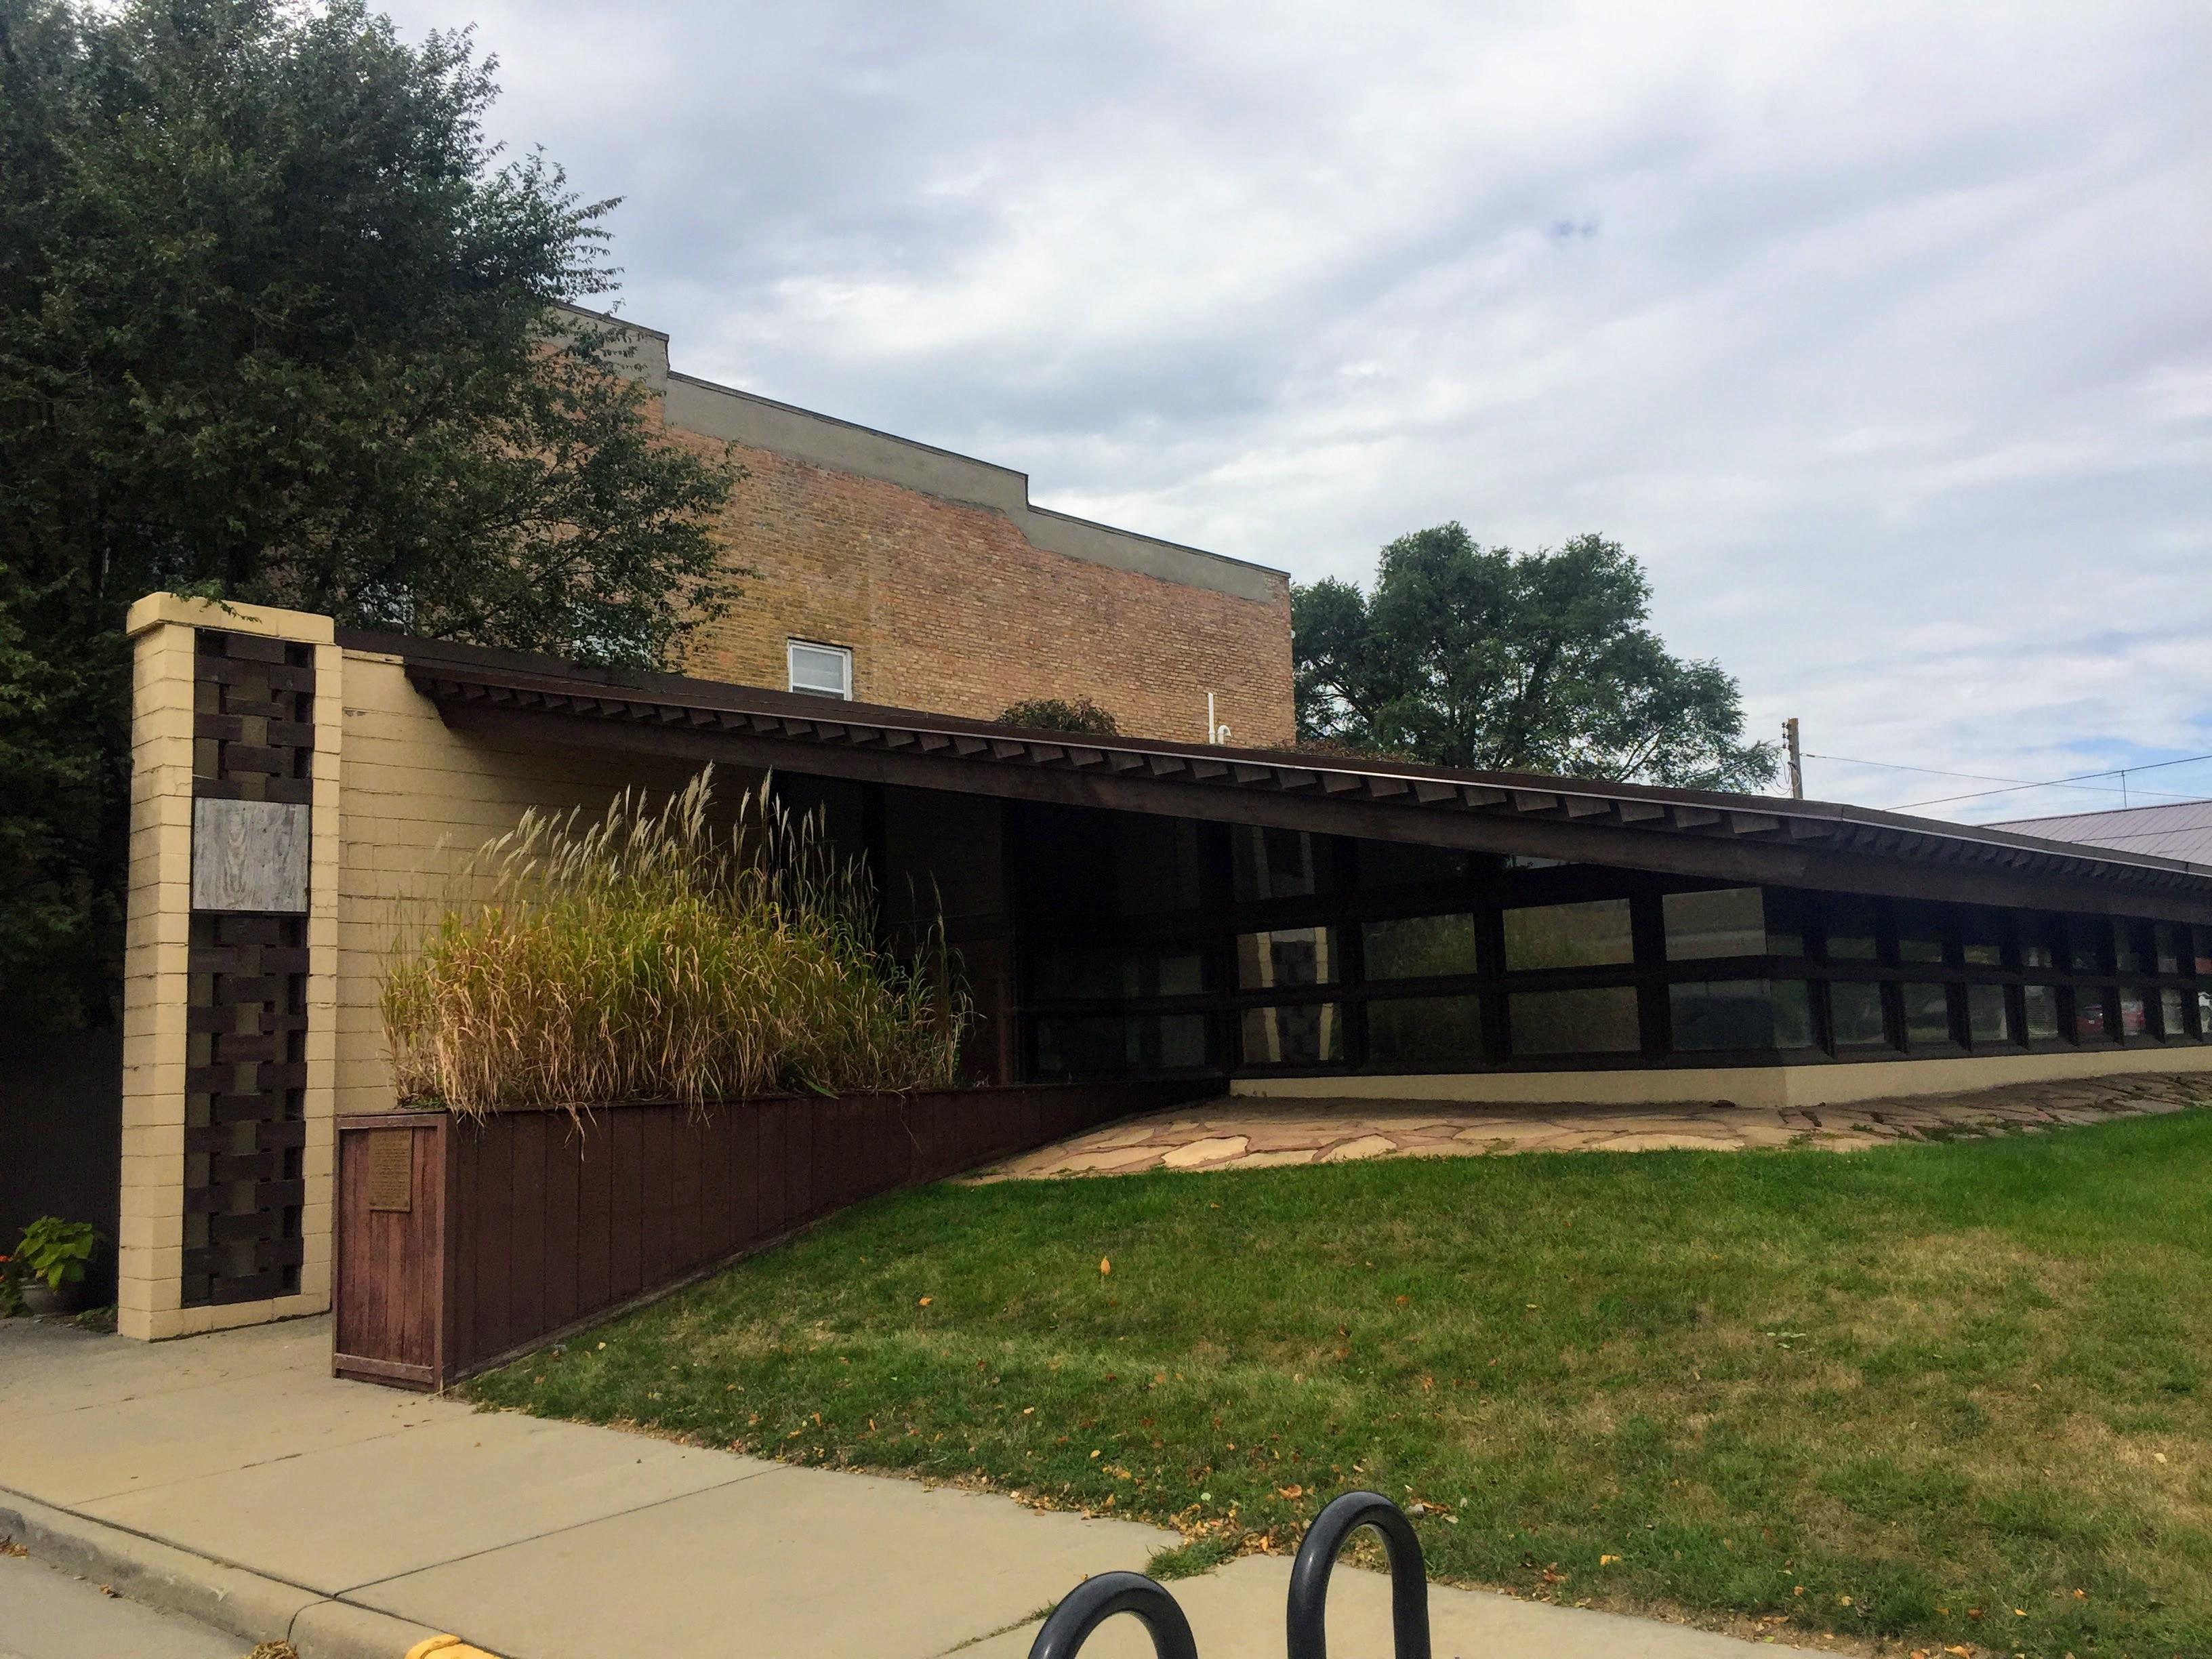 2017-09-07 Medical Office-turned Residence 01